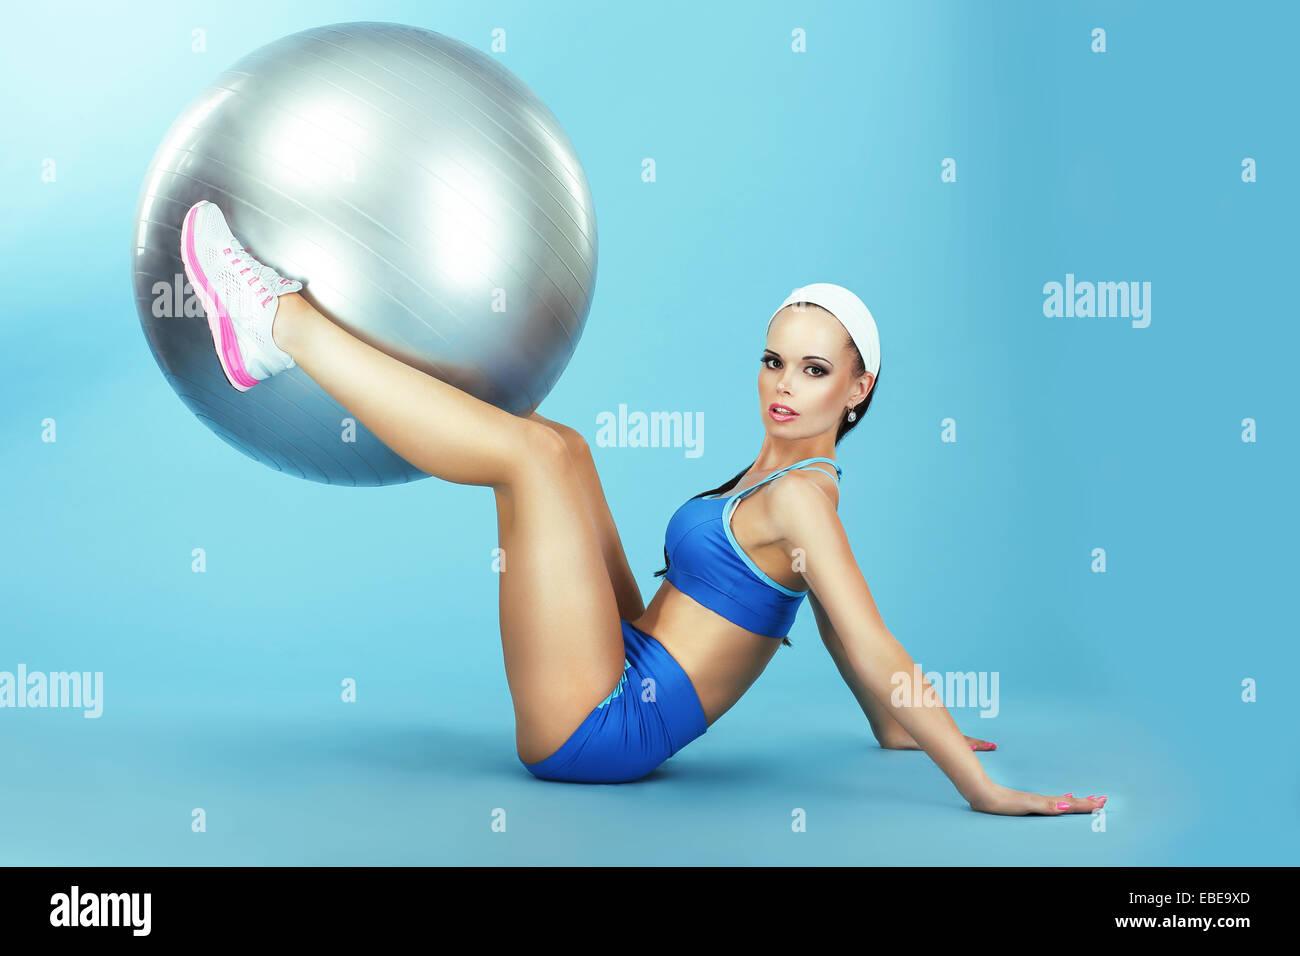 Ausbildung. Leichtathletik. Frau in Sportkleidung mit Fitness-Ball Stockbild